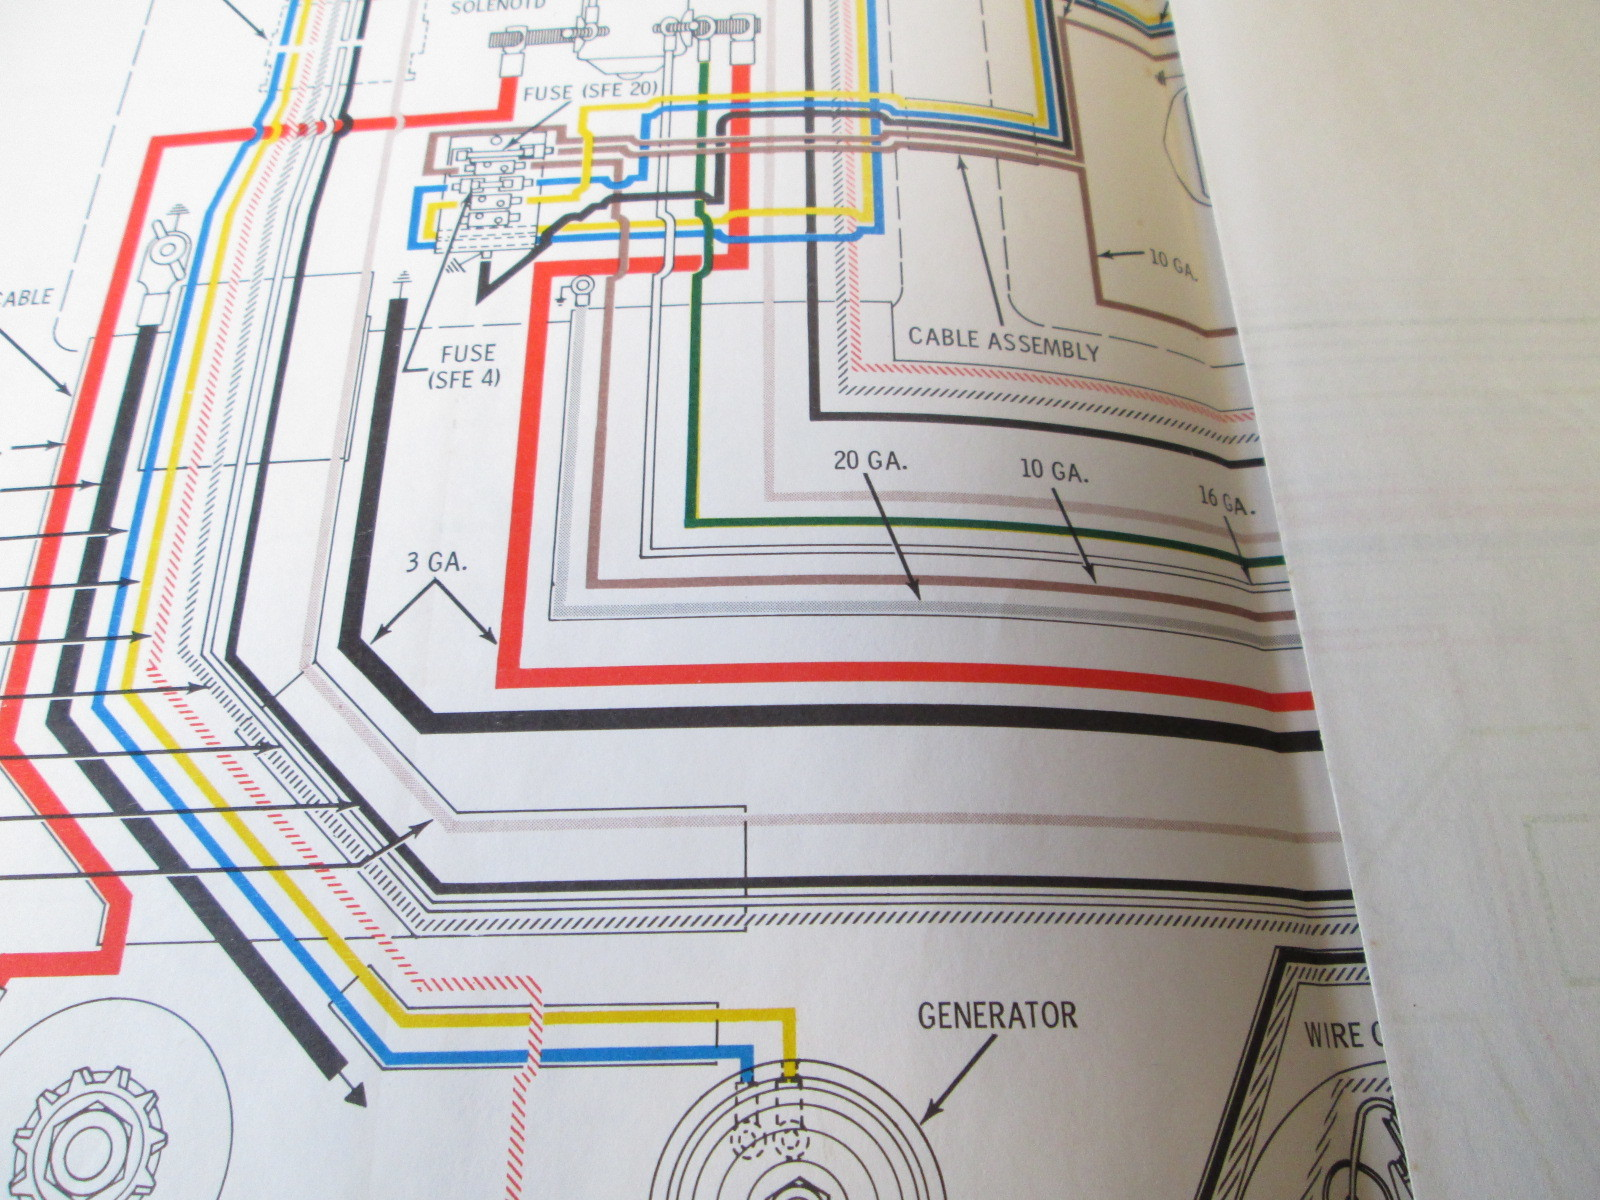 90 hp wiring diagram for nissan wiring diagram RCA Wire Diagram nissan 90 hp outboard wiring diagram wiring diagram schematics \\u202290 hp wiring diagram for nissan